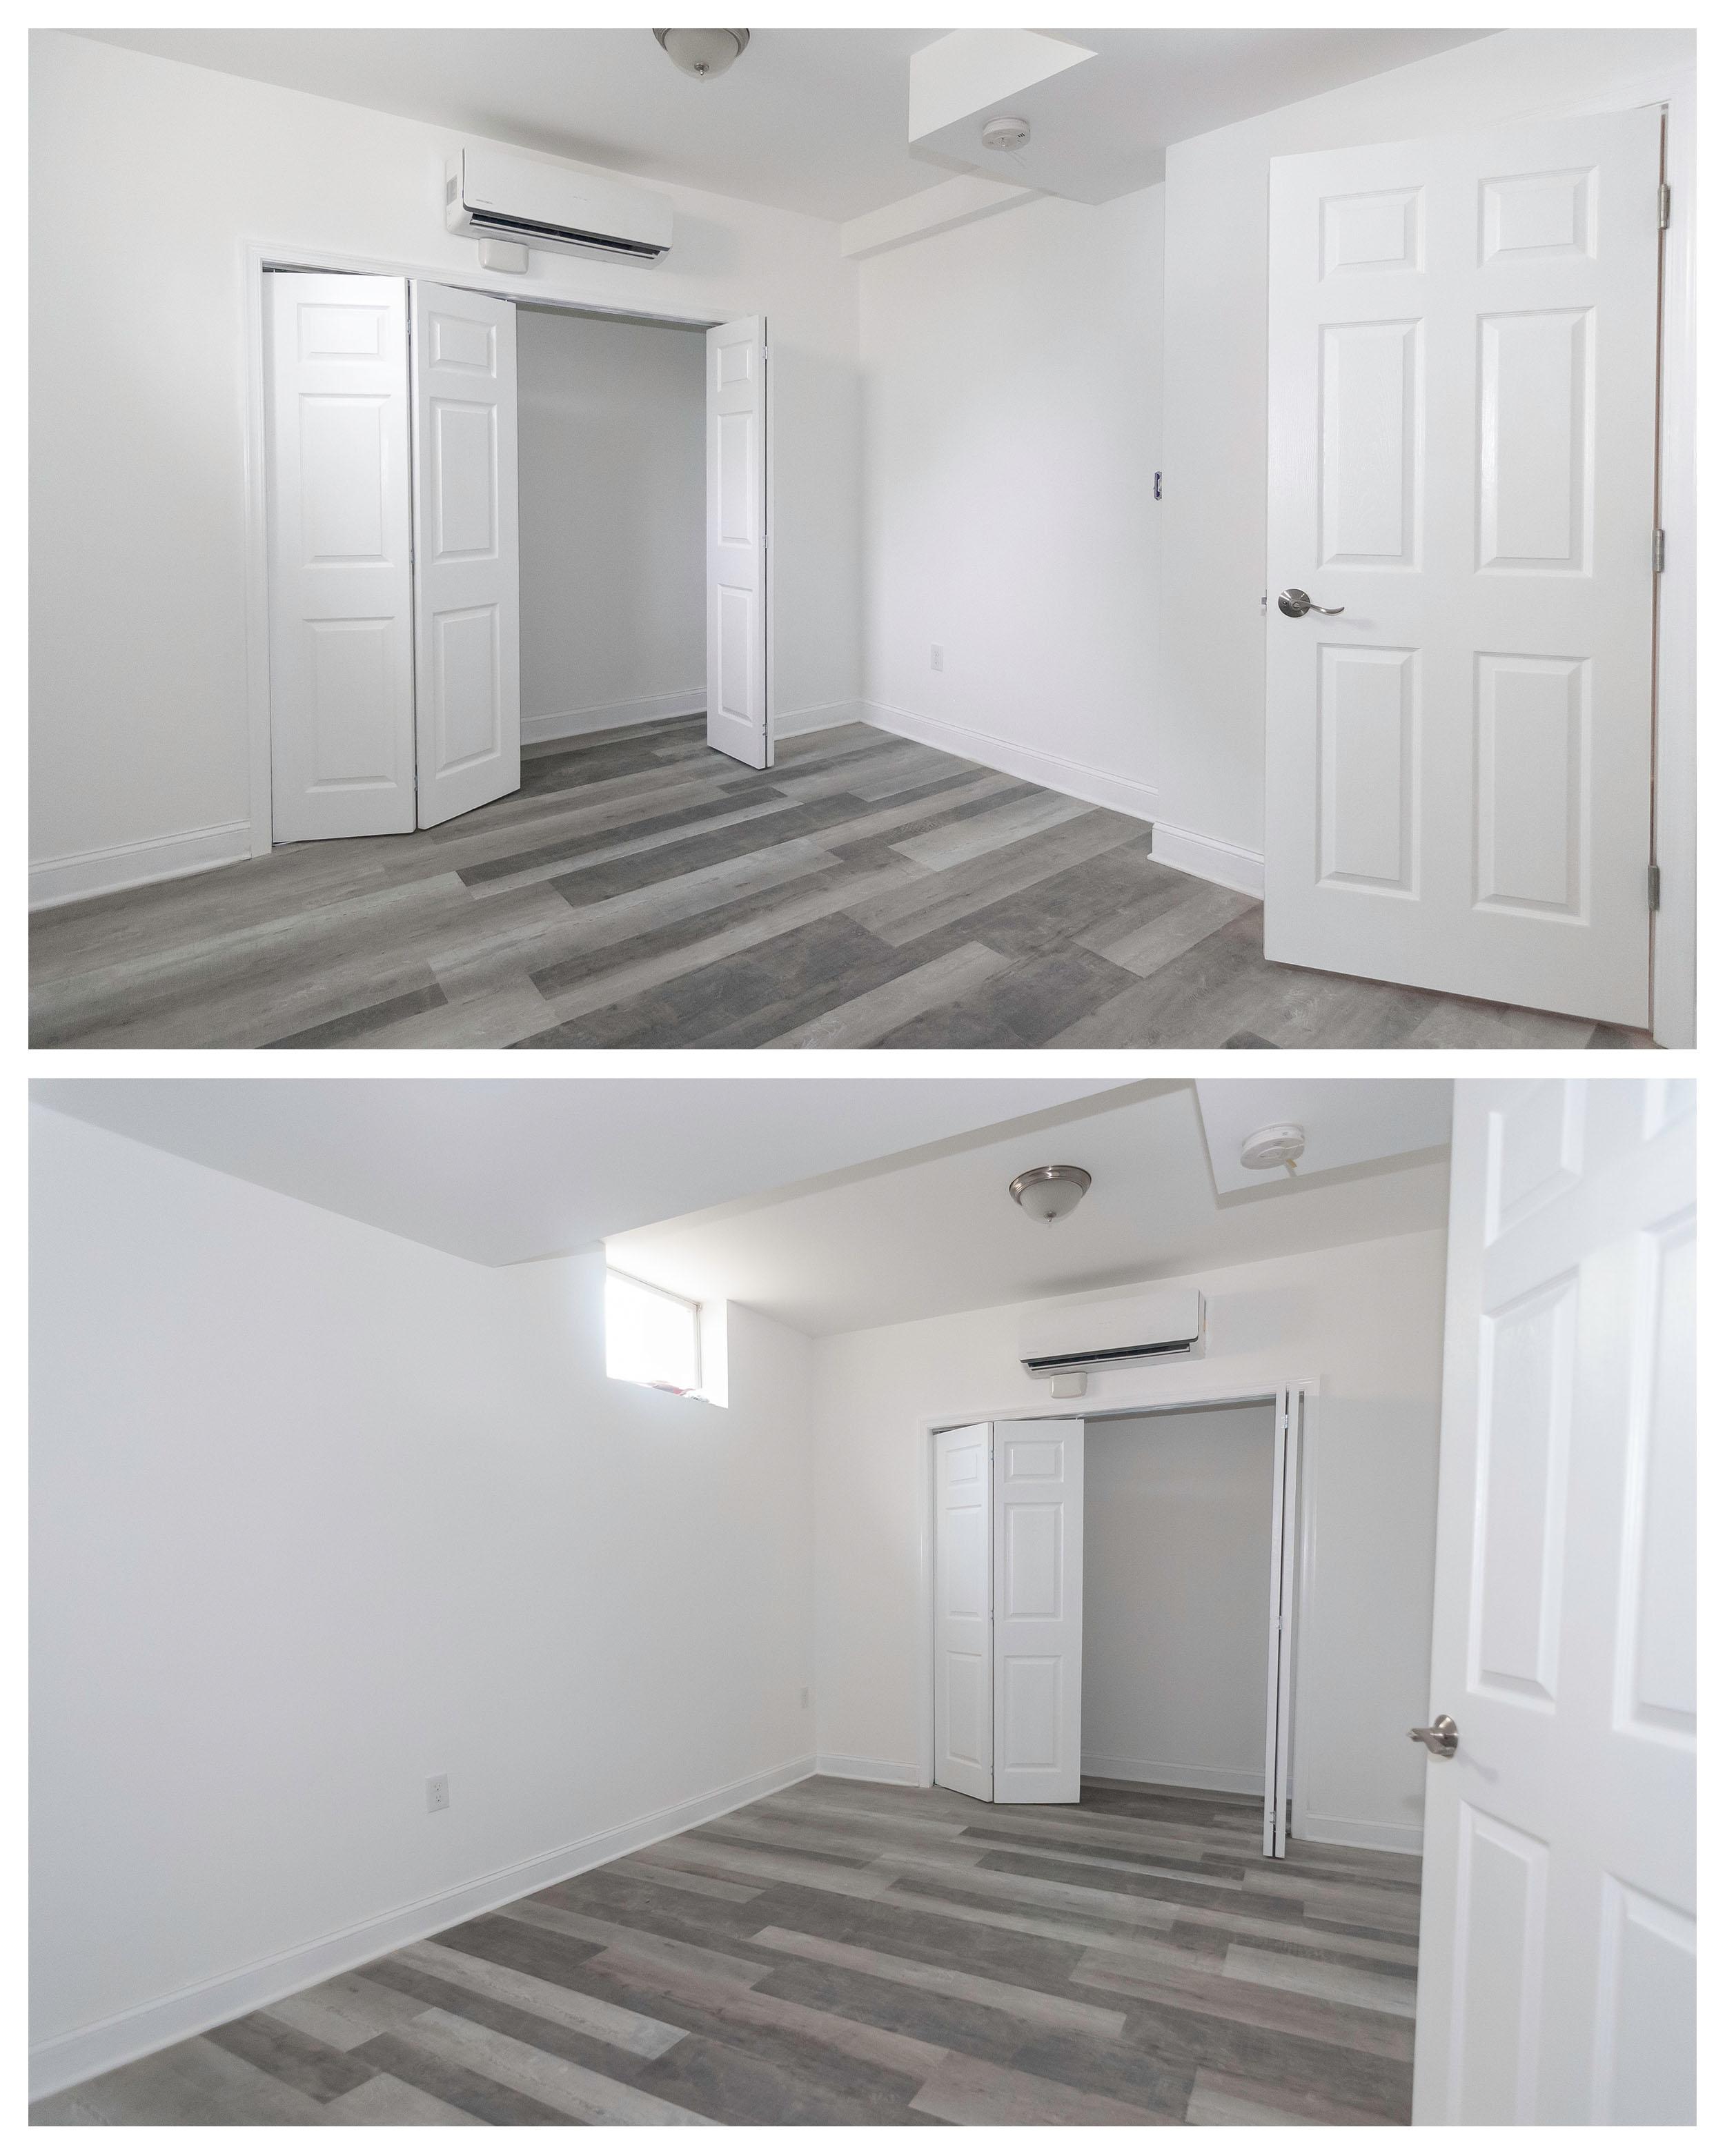 6 Harness Bedroom Comparison.jpg